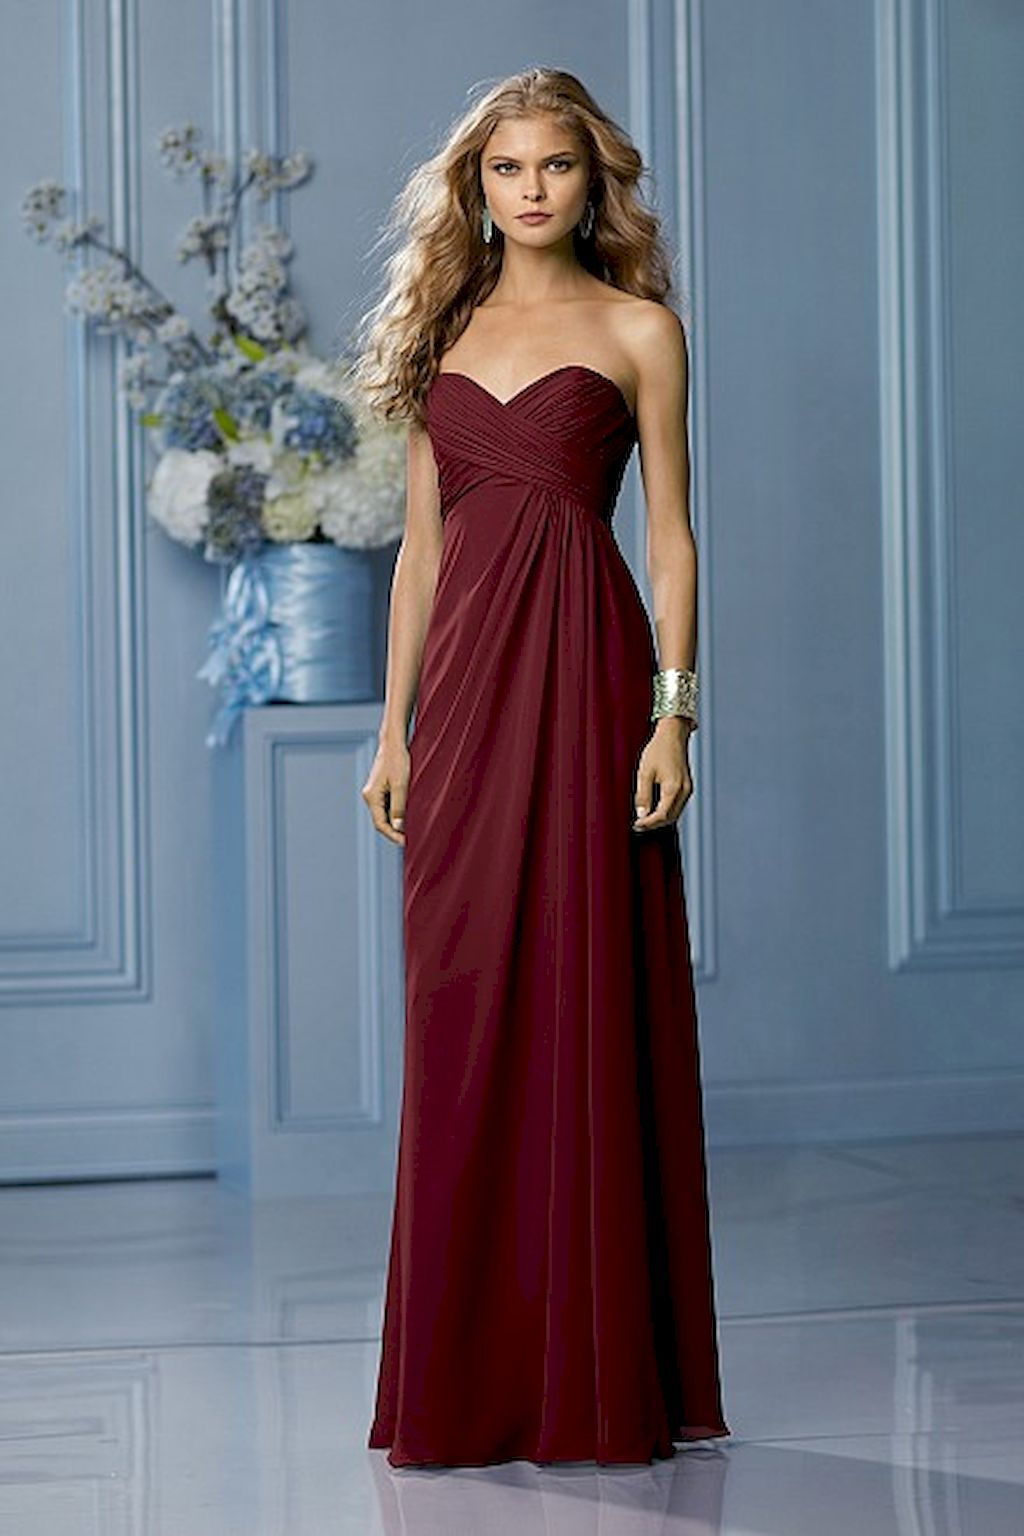 66 Breathtaking Burgundy and Marsala Bridesmaid Dresses Ideas ...